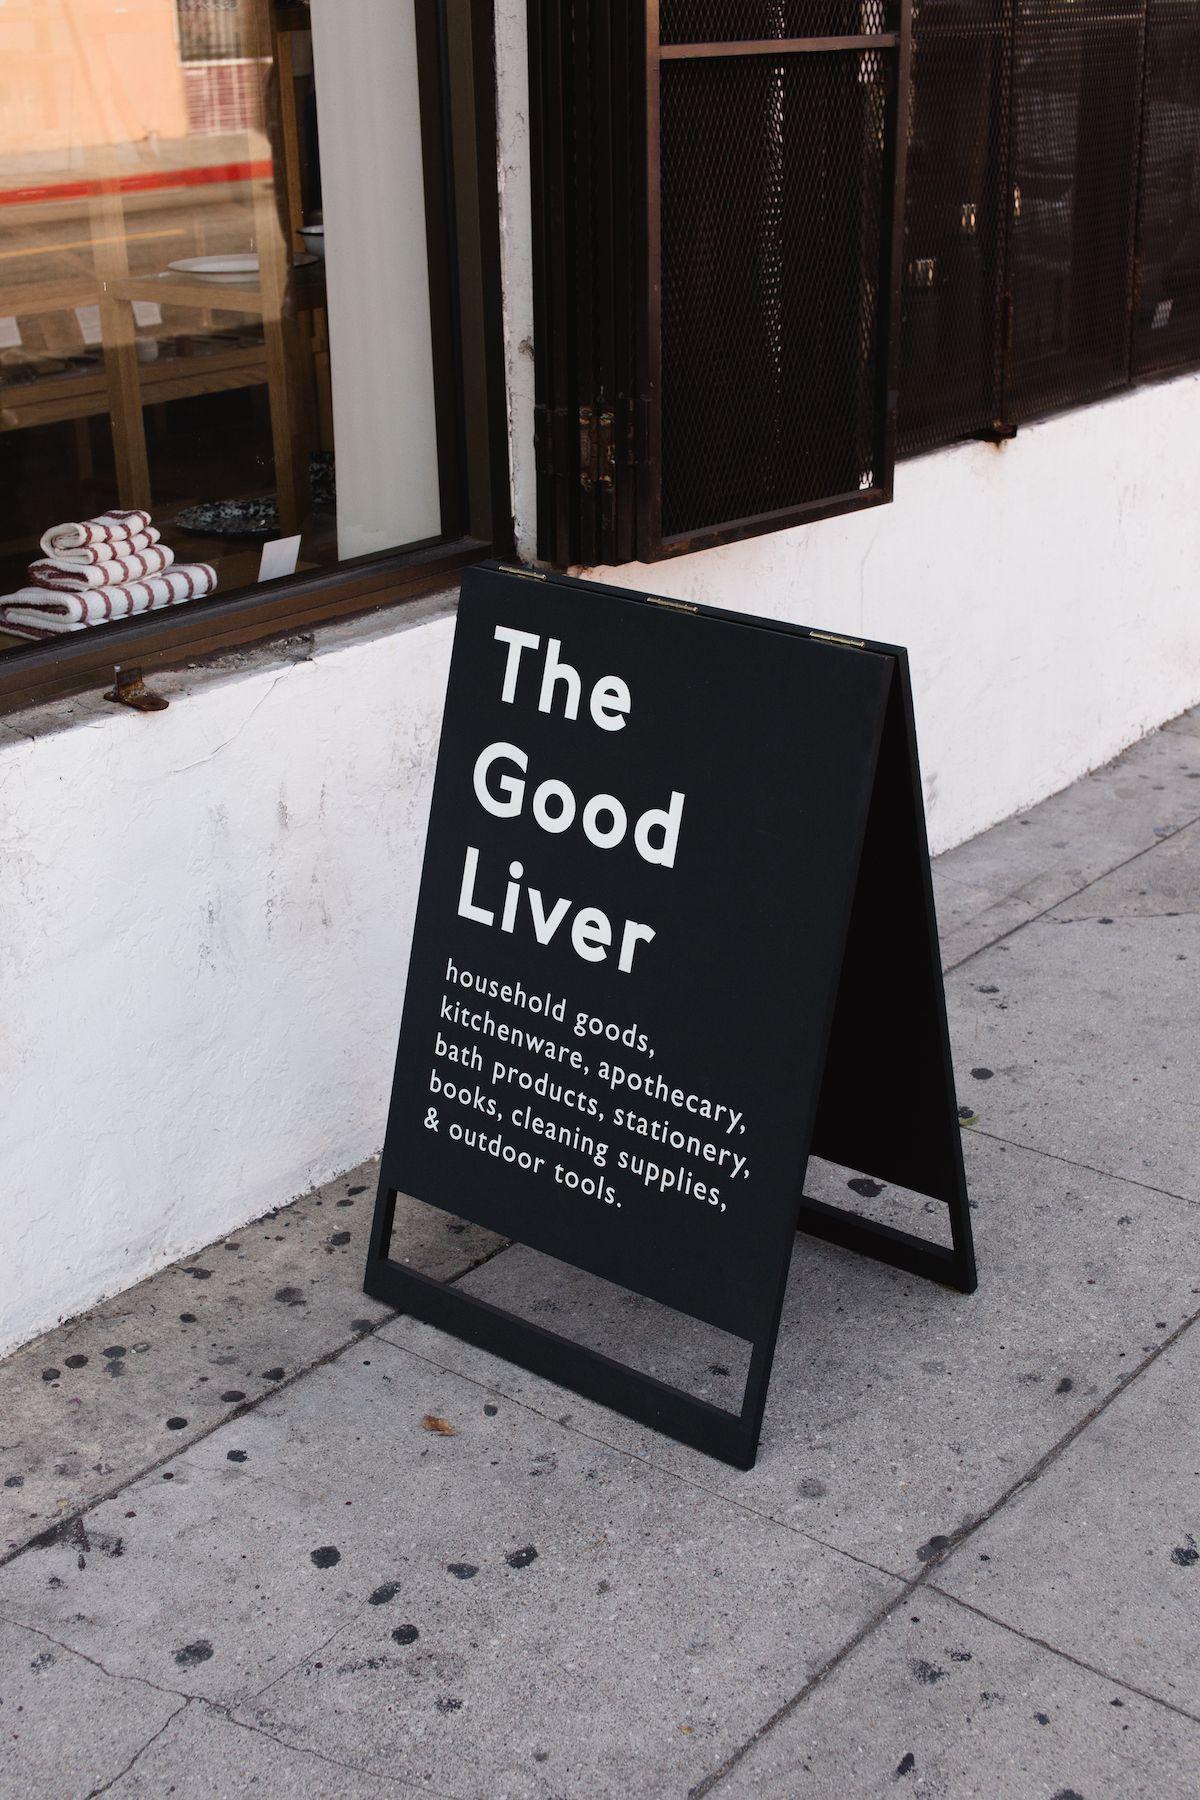 The Good Liver La Fashion And Lifestyle Blog Take Aim サイン デザイン コーヒーの看板 A看板